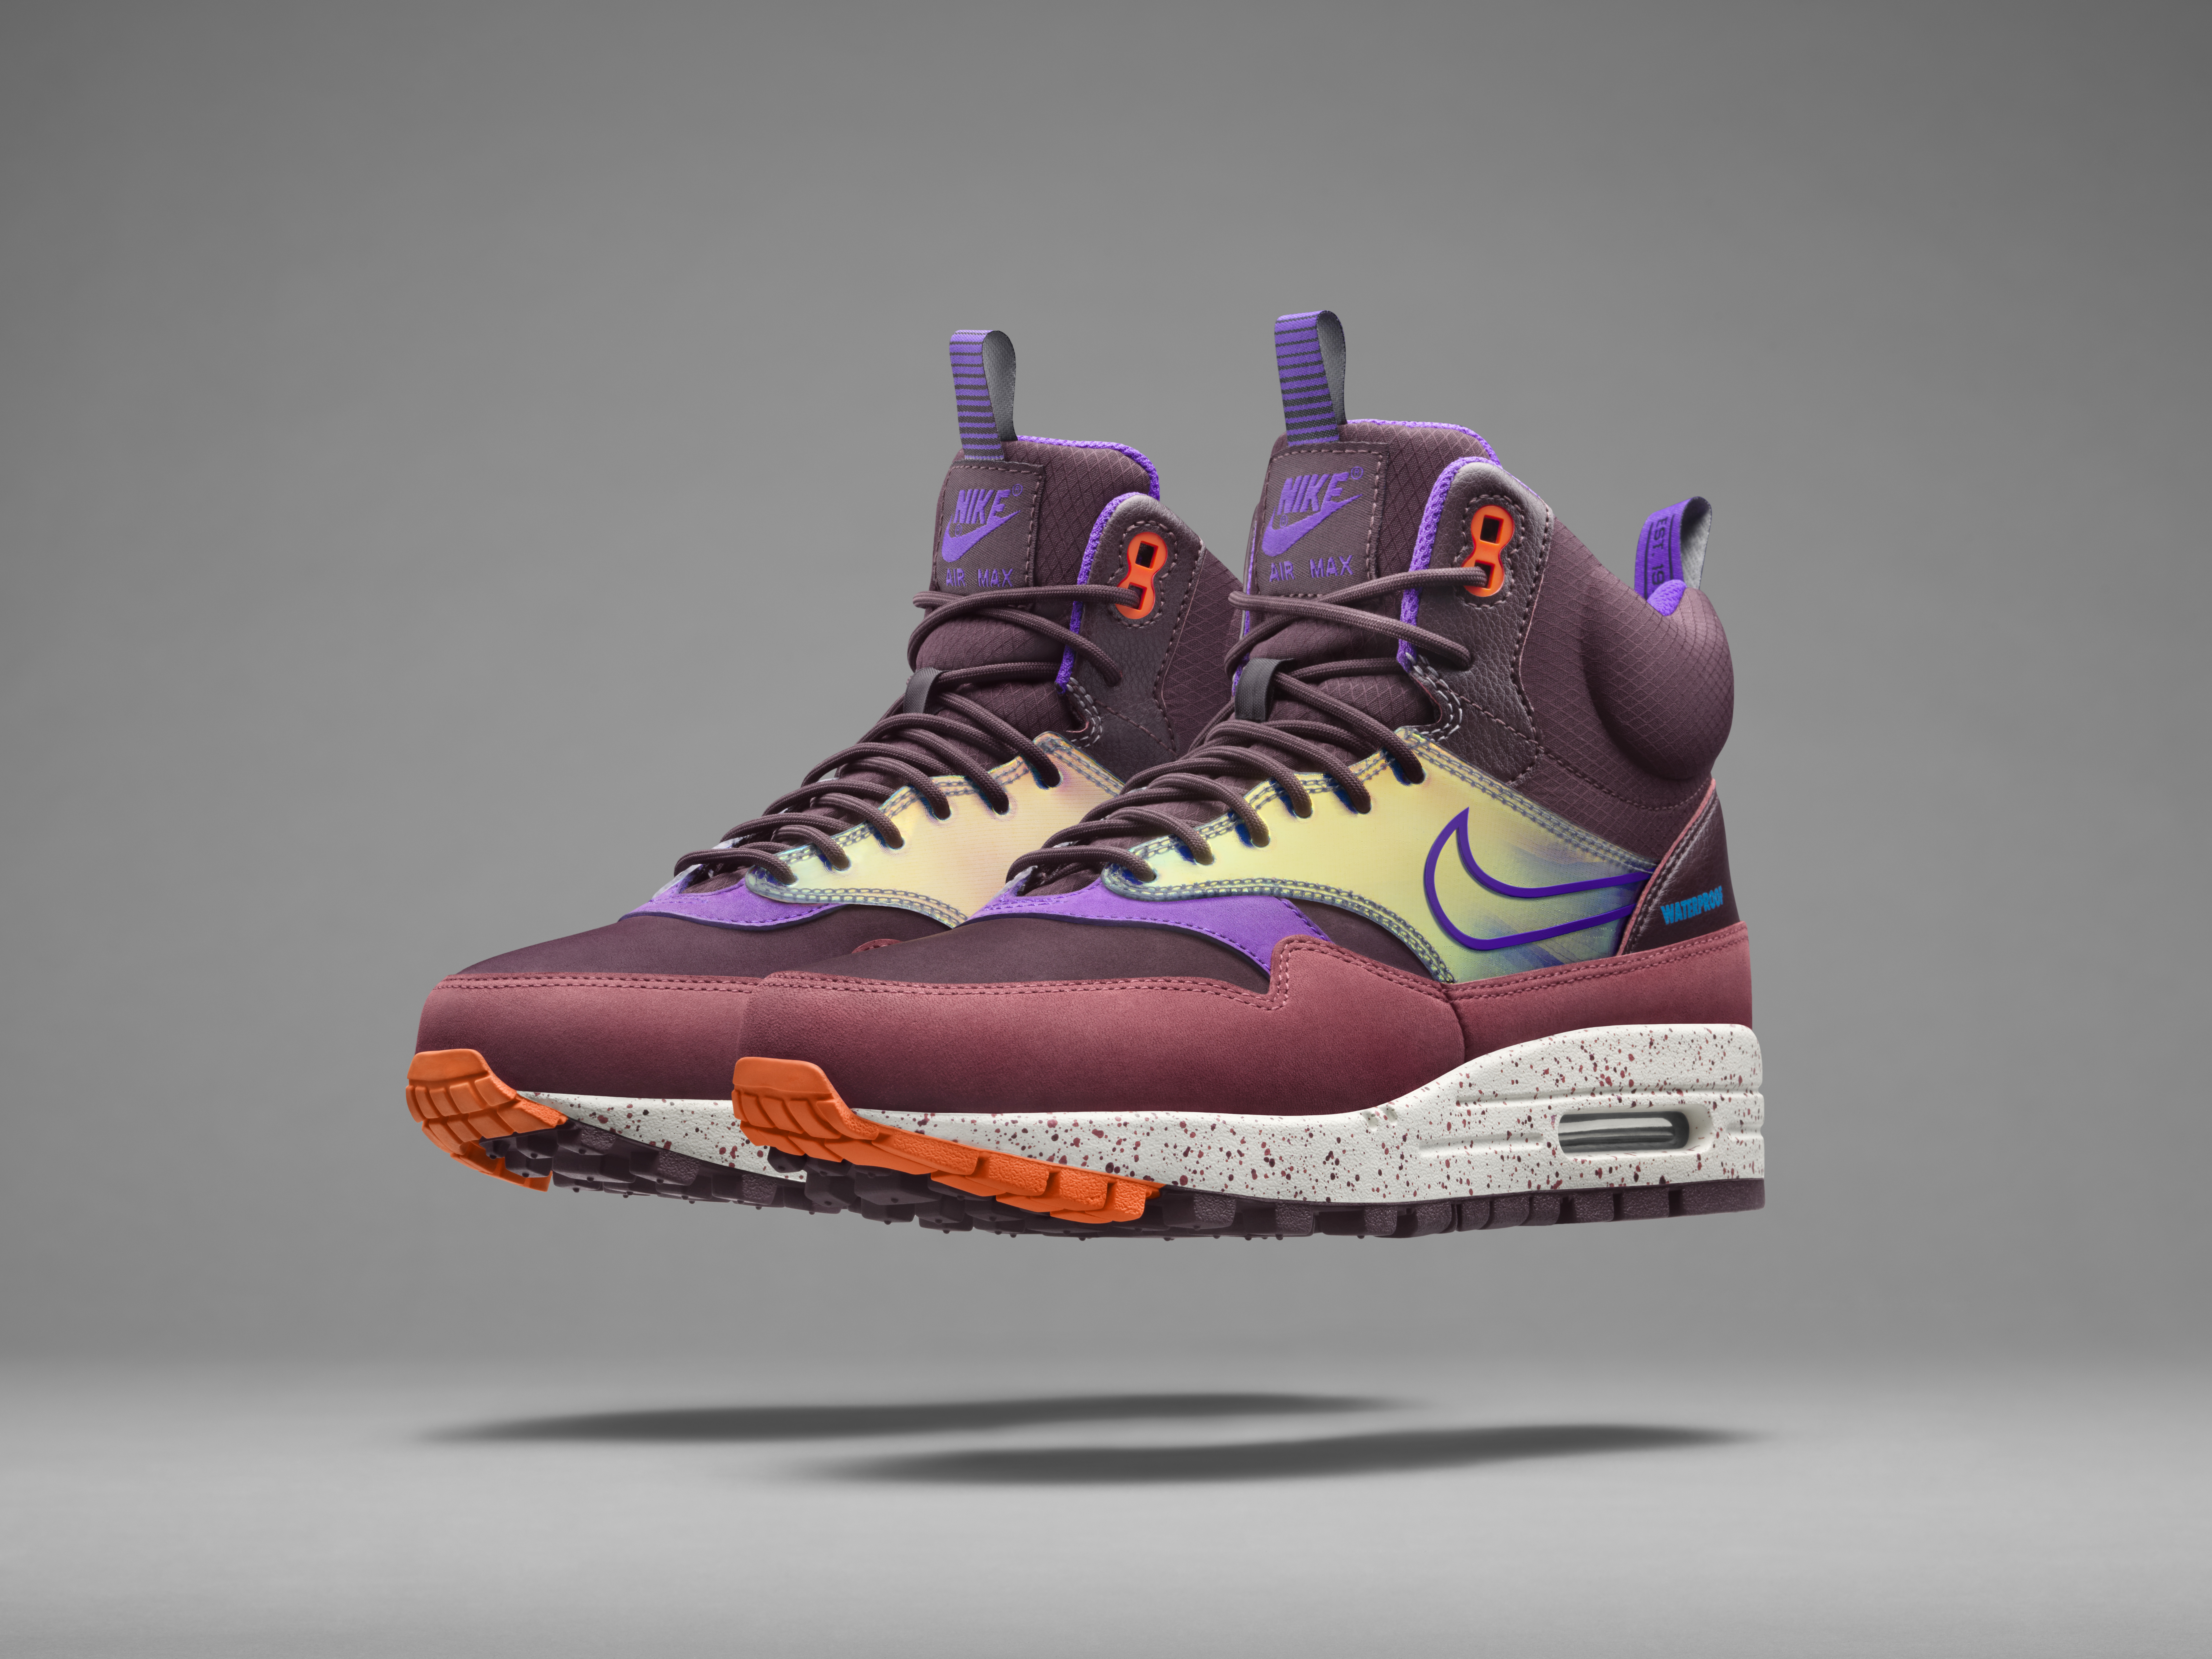 Lgquzjsmvp Bot Nike Co Aromaproducts Uk Sneaker MGUVqzpS